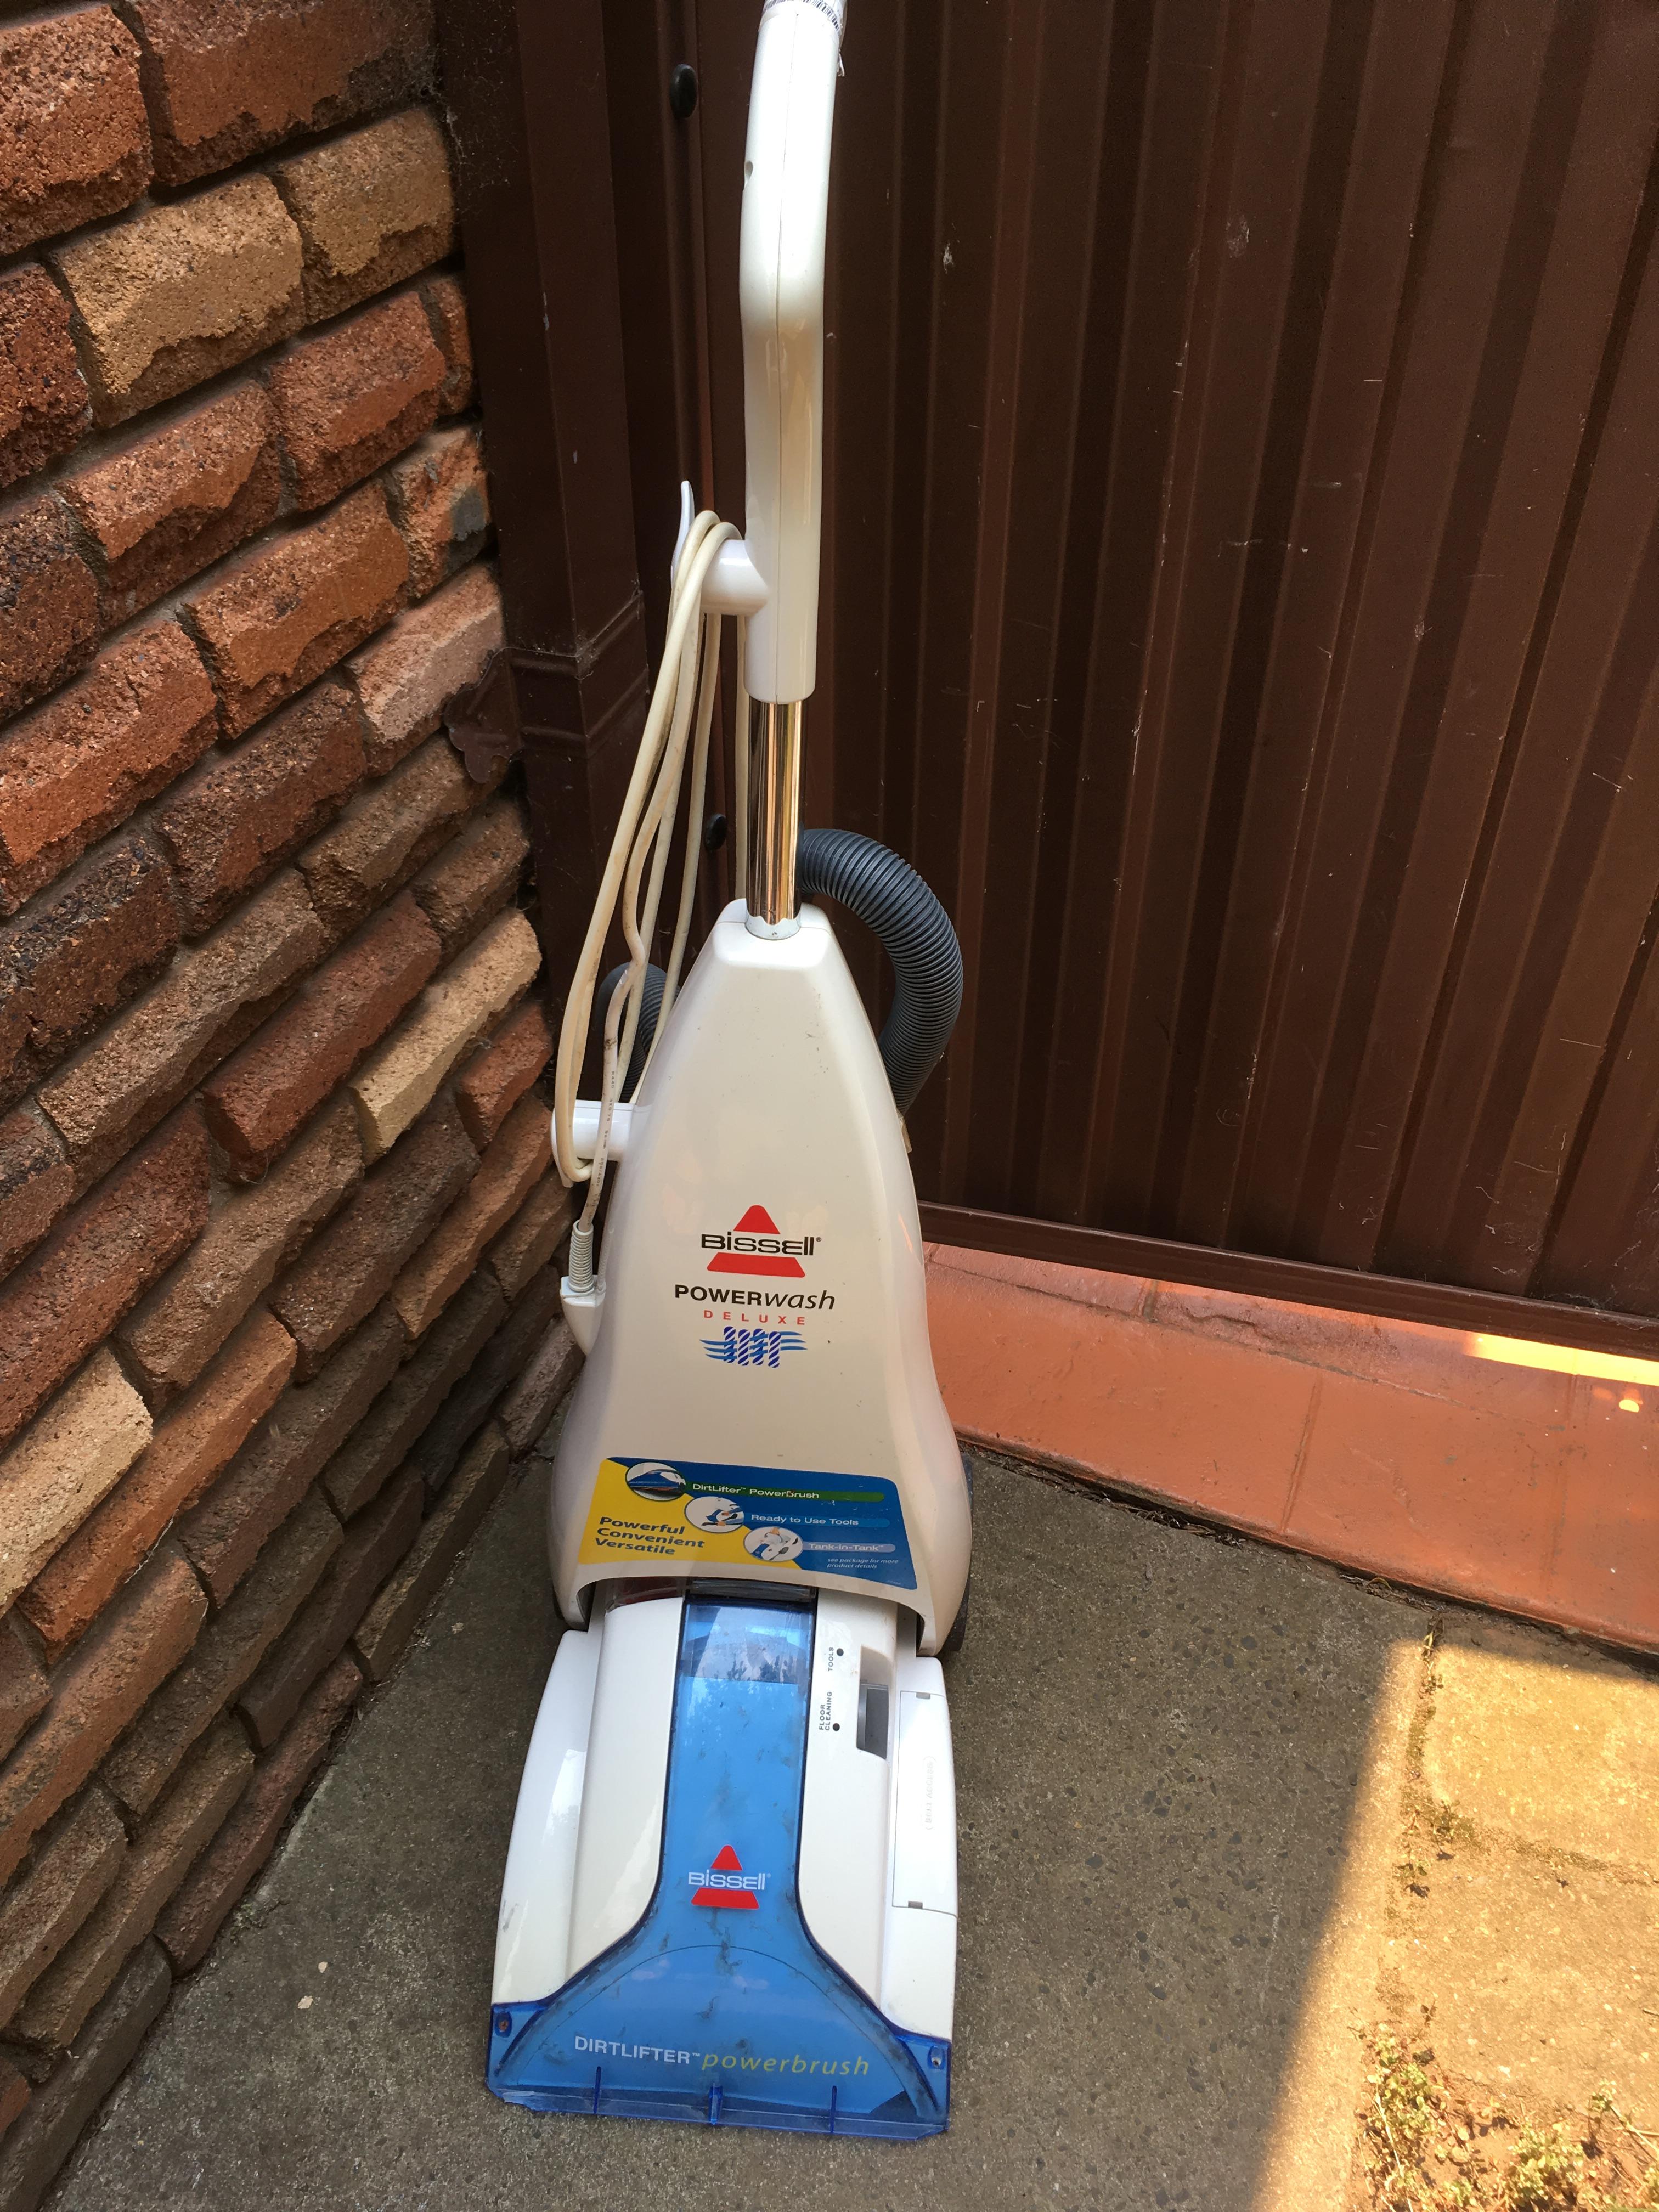 Bissell Powerwash Carpet Shampooer Model 1694 – F